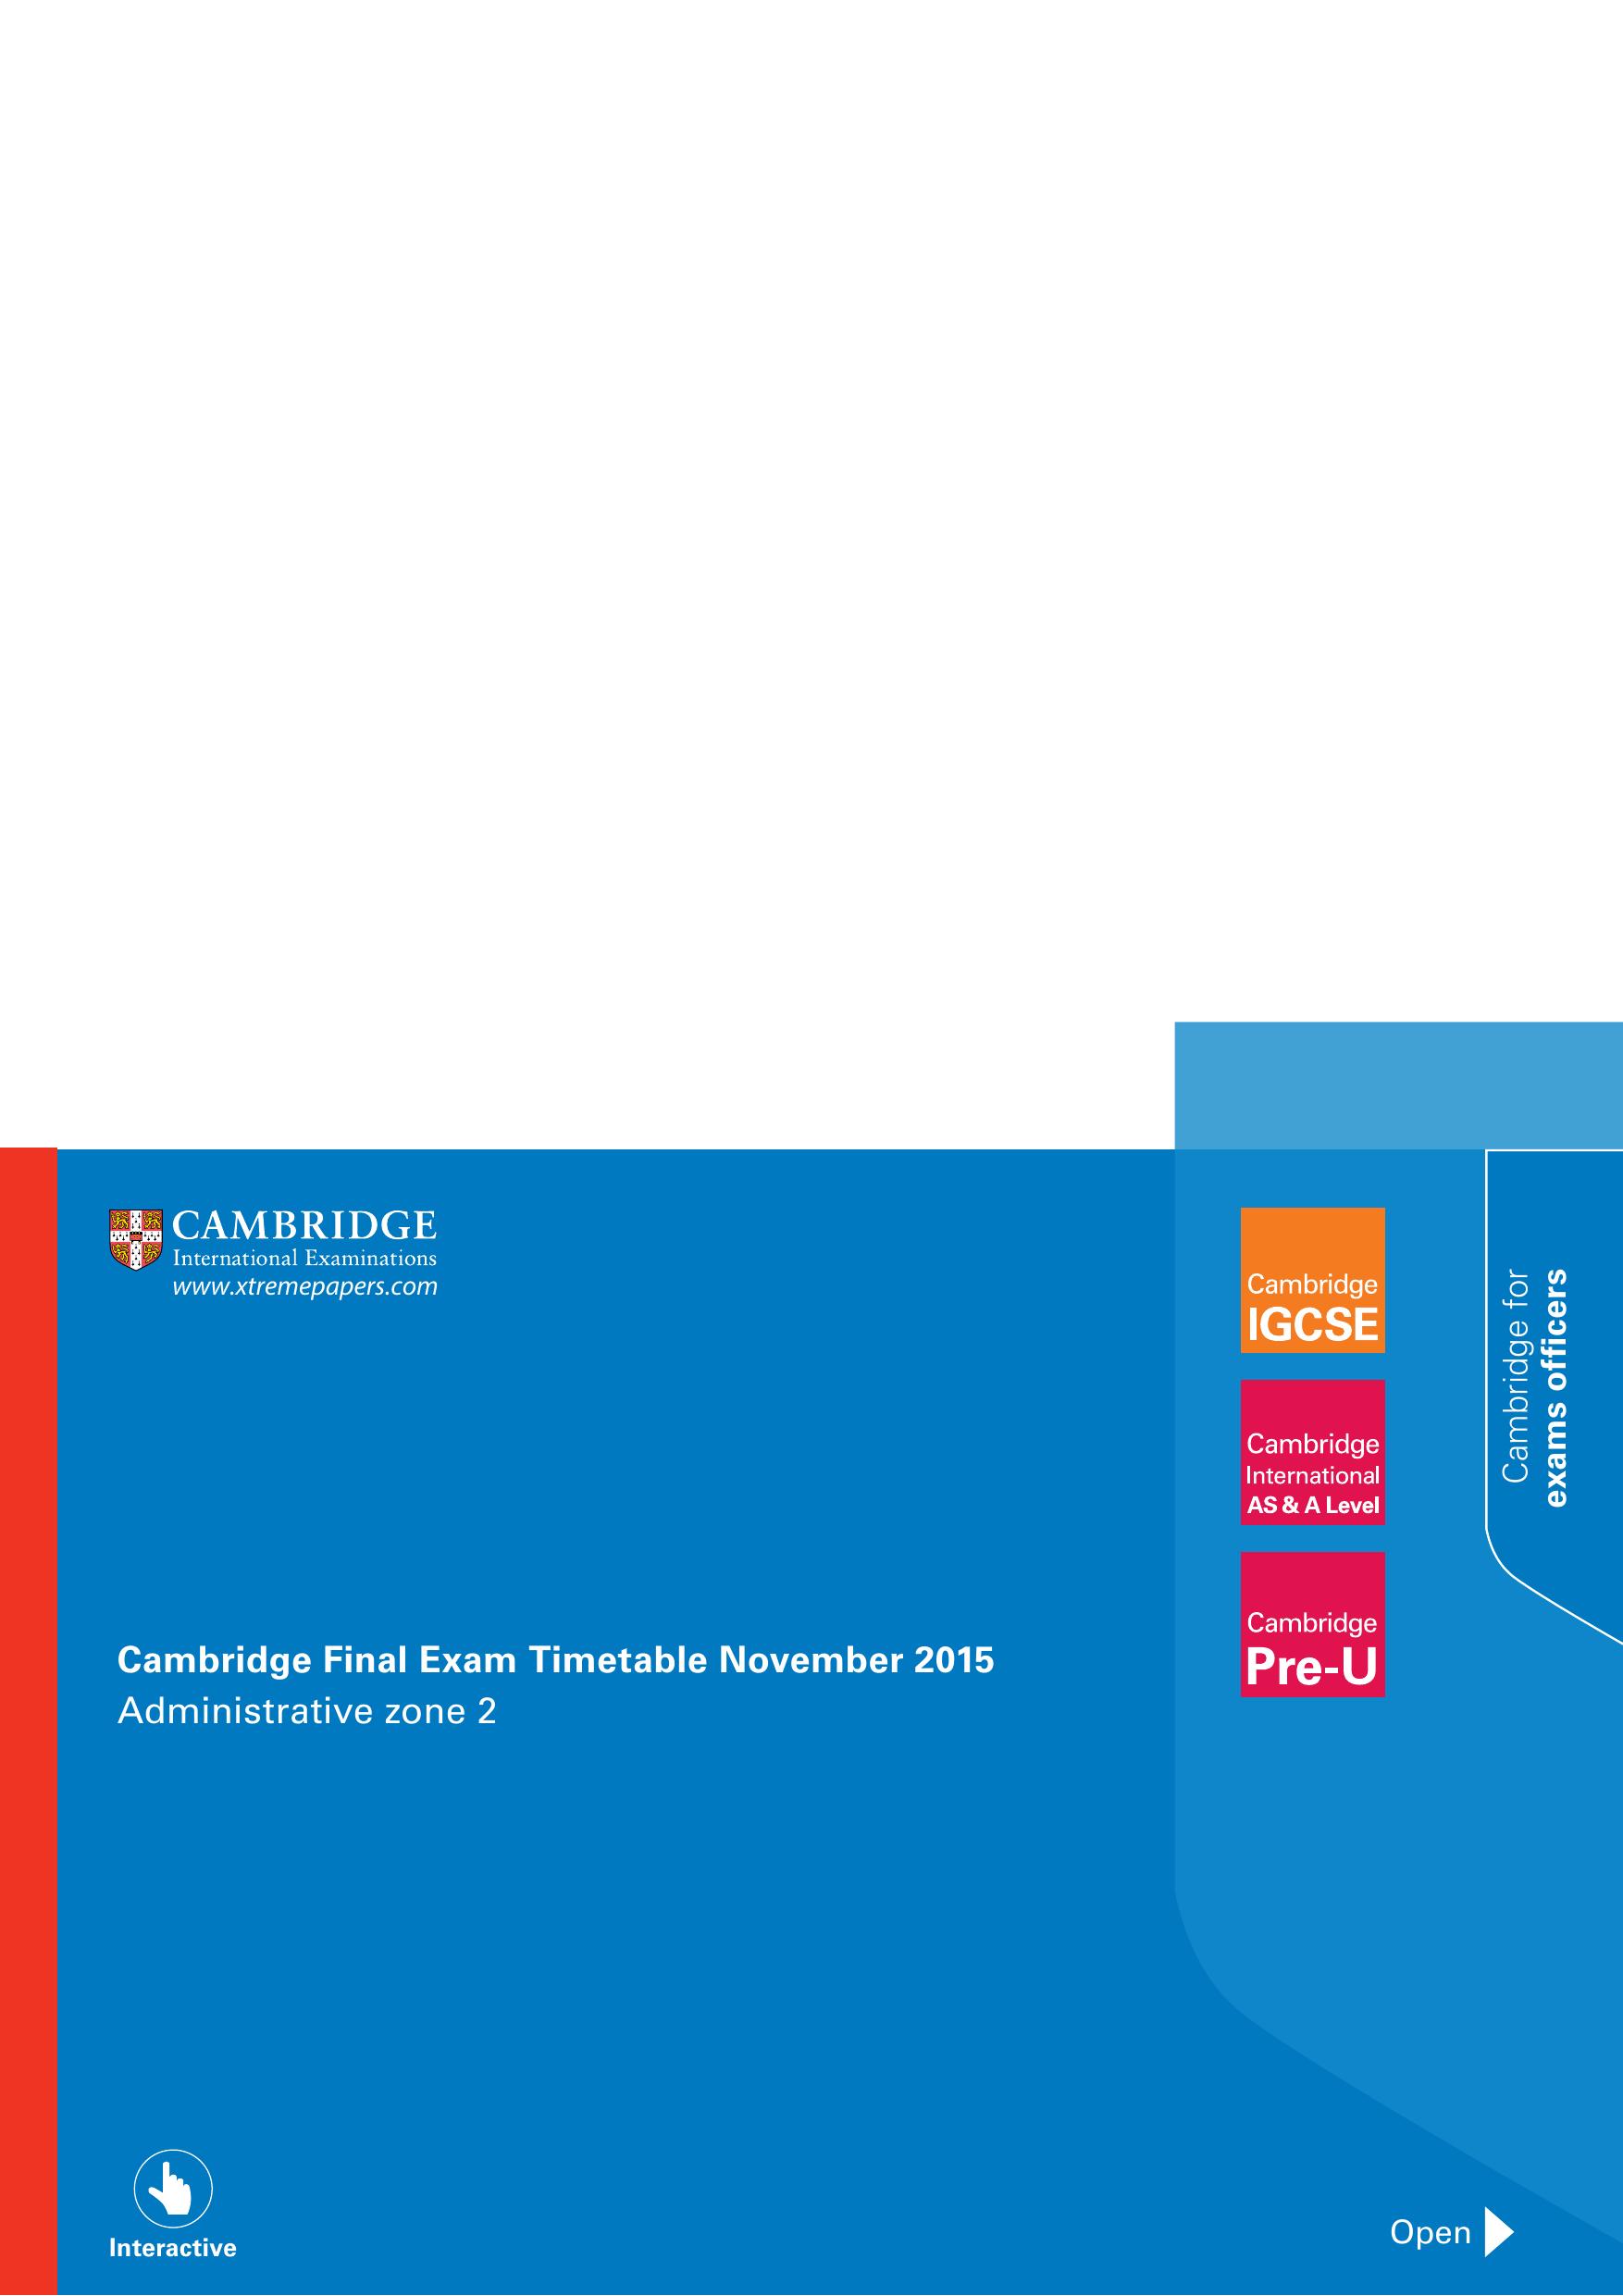 Cambridge Final Exam Timetable November 2015 Administrative